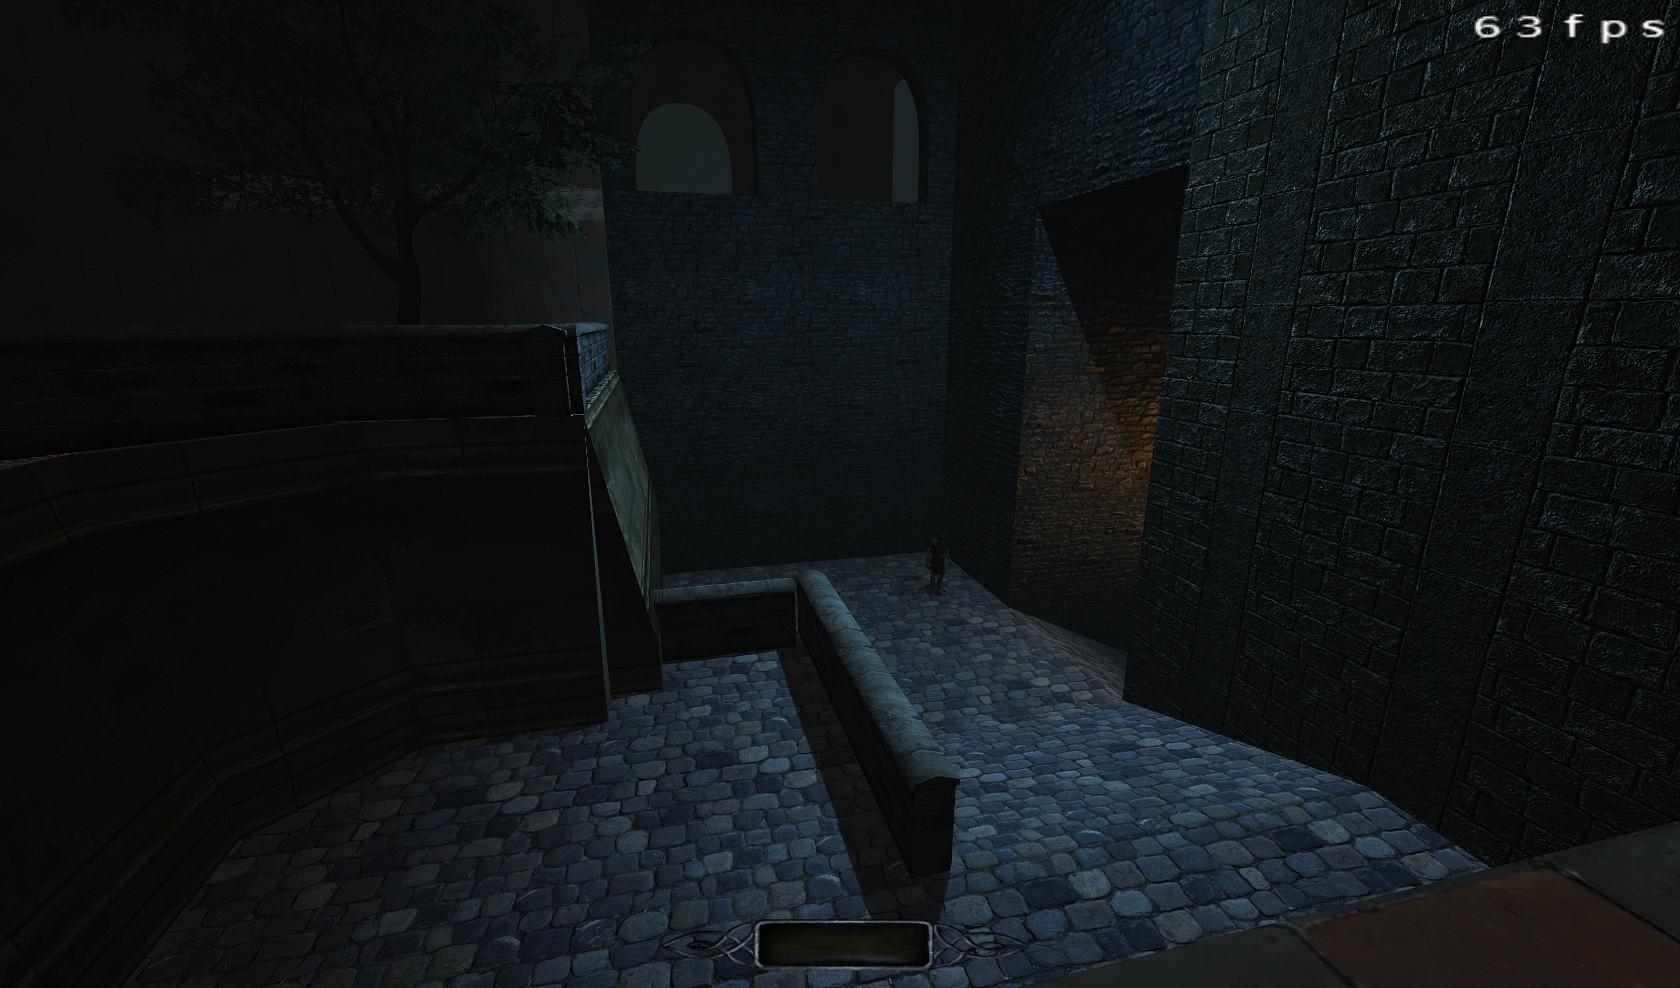 darkmod_2019-03-23_23.53.59.jpg